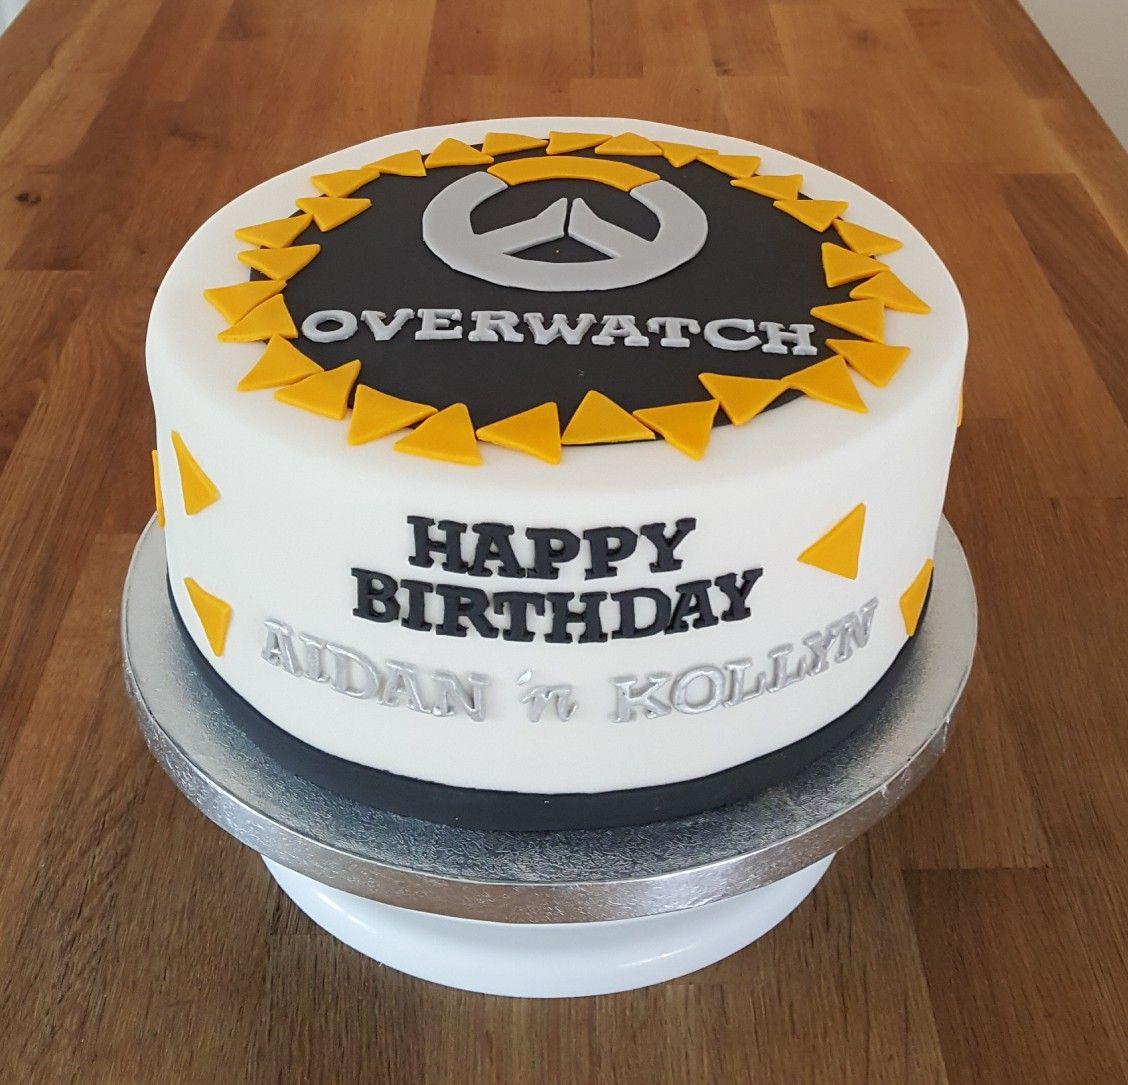 Overwatch theme birthday cake | Pasteles de cumpleaños in 2019 ...